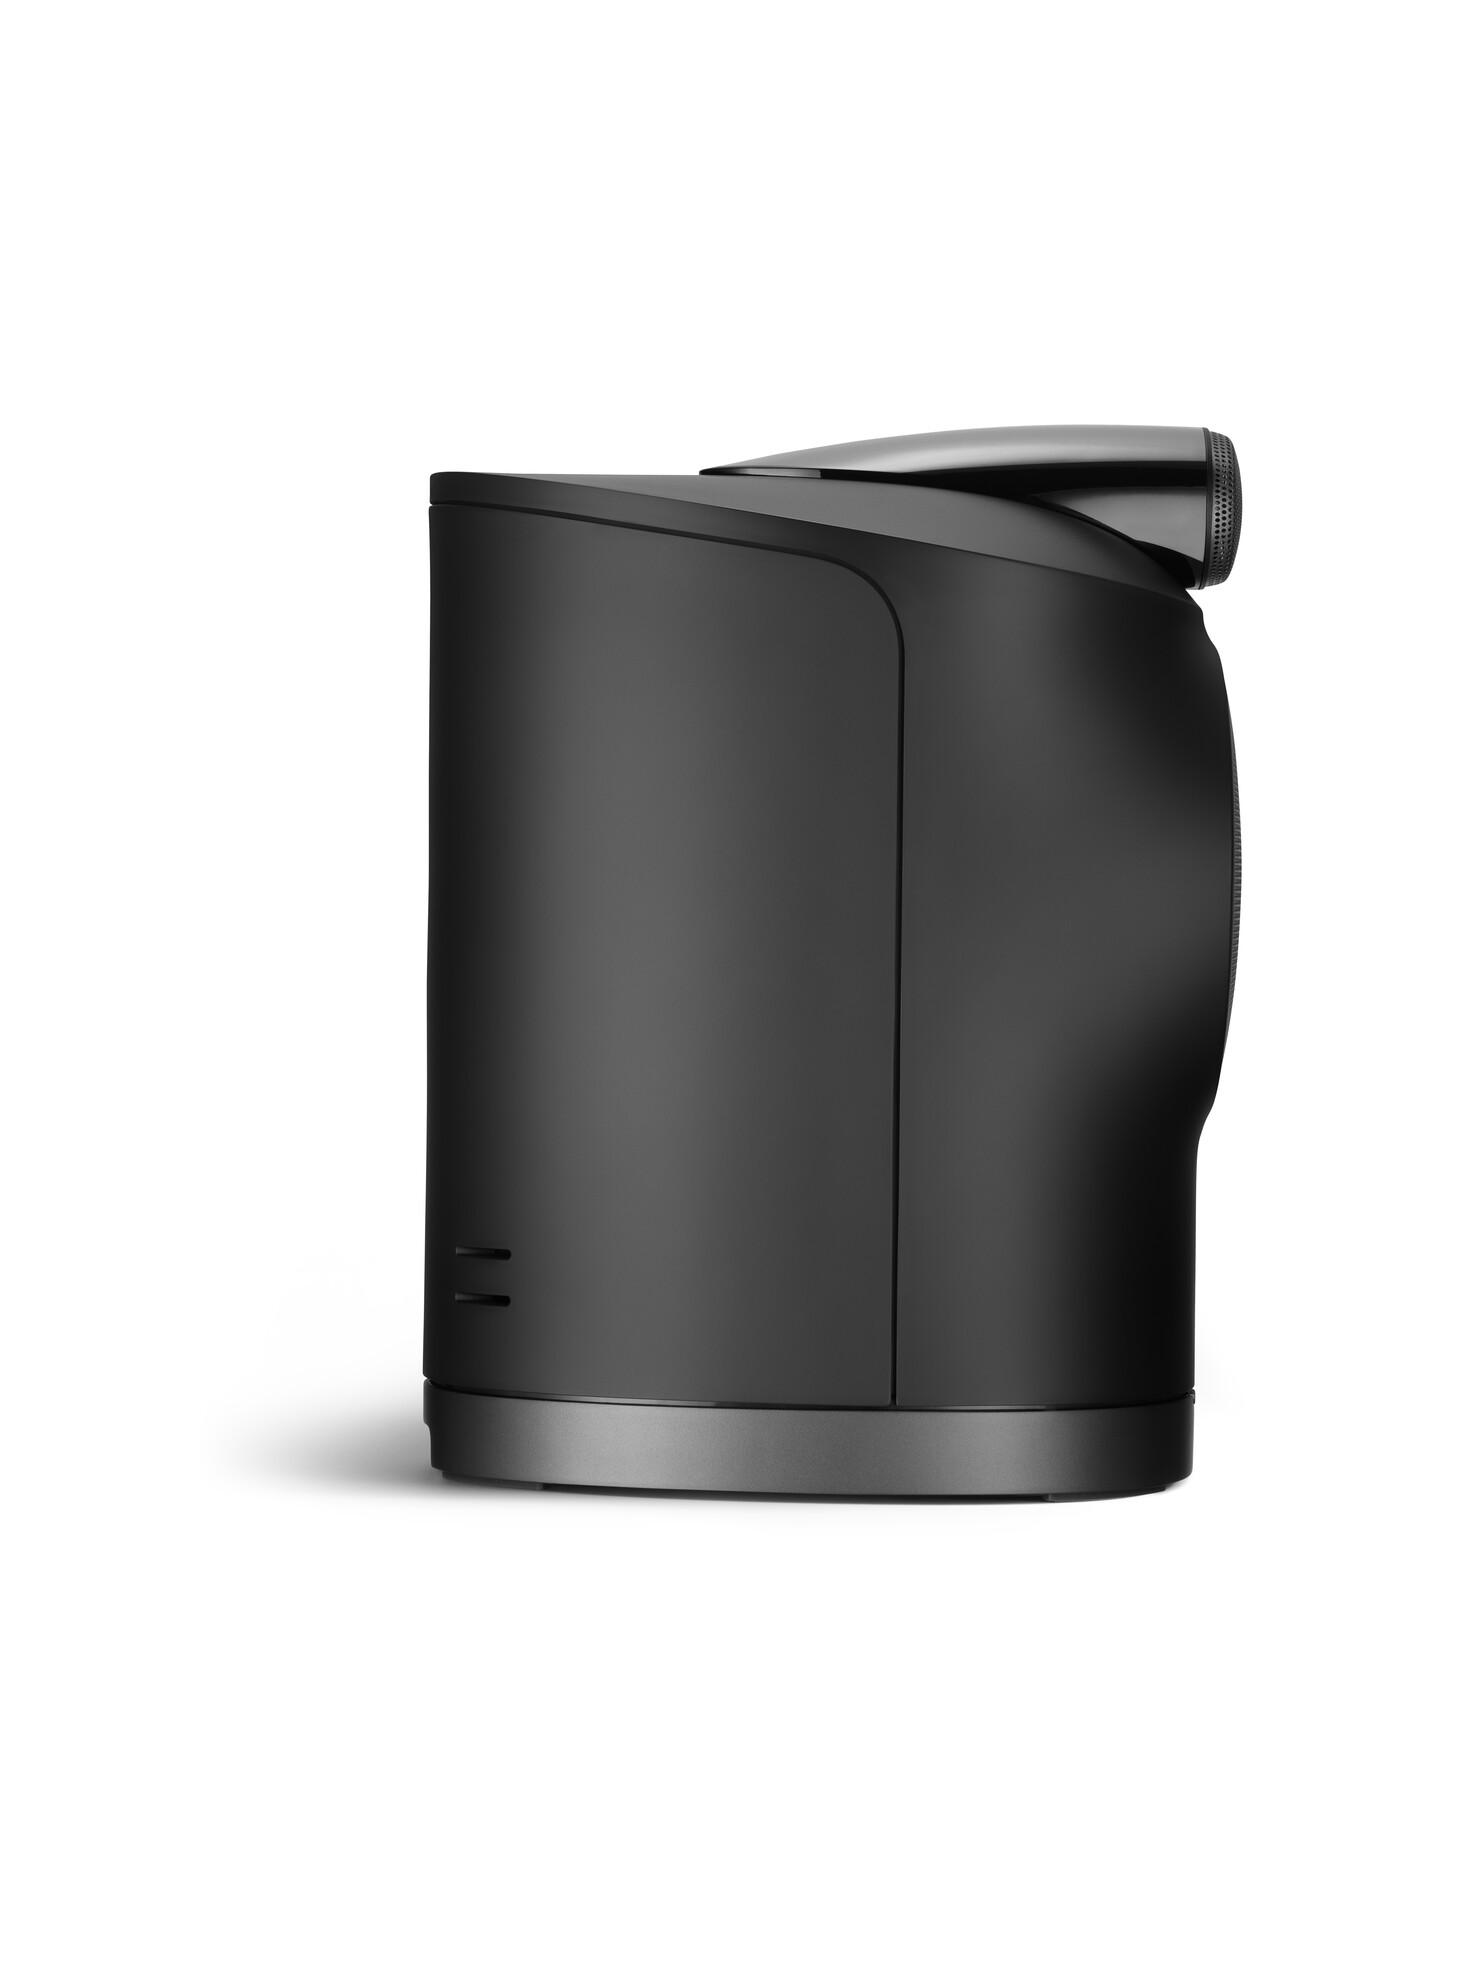 Bowers-Wilkins-Lautsprecher-Aktiv-Formation-Duo-Black-Elektro-Hifi-Erlebnis-Fachhandel-Dornbirn-Vorarlberg-Shop-Beratung-Fachberatung-Experte-Service-Kreil-3